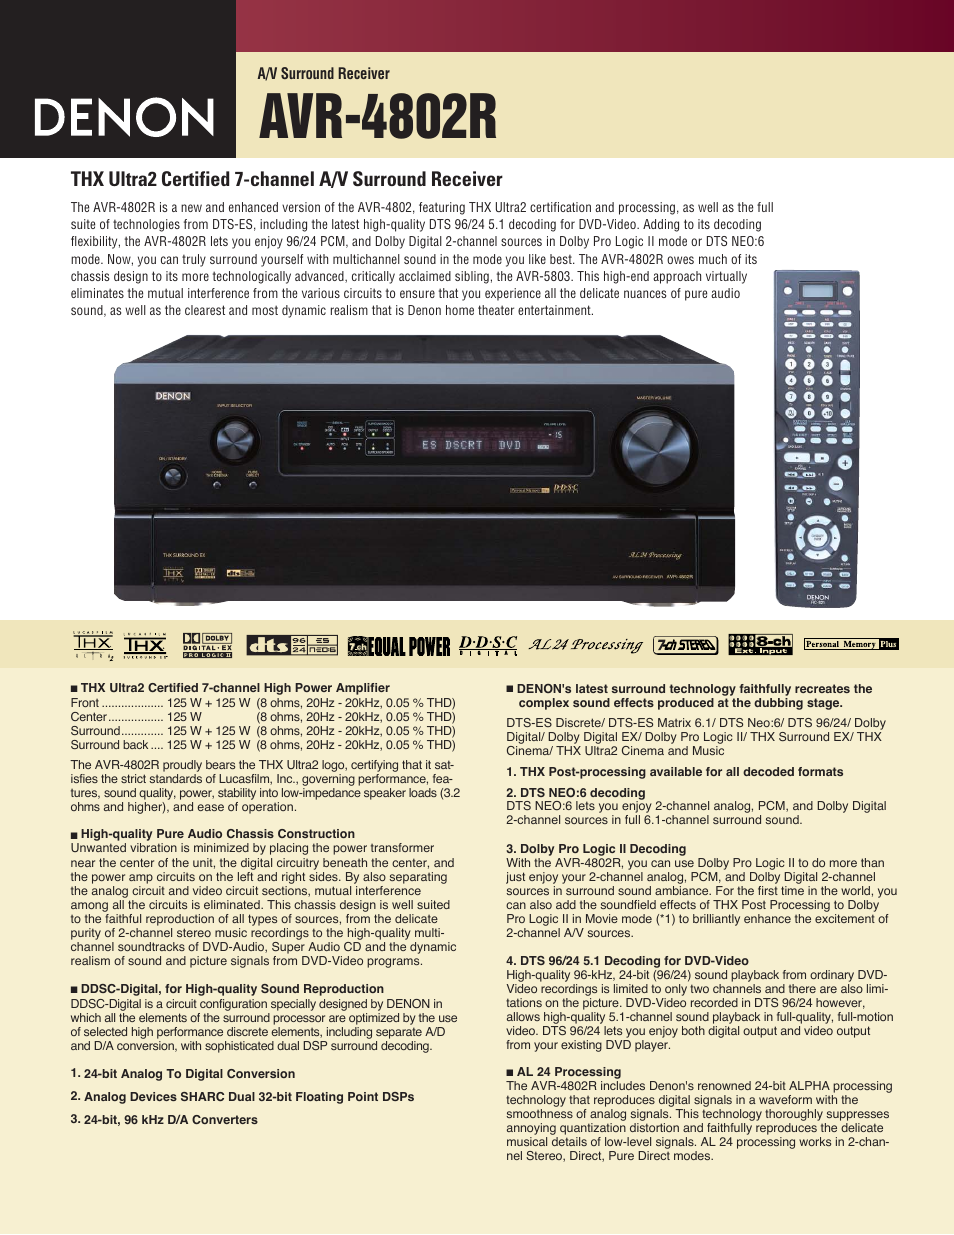 denon avr 4802r user manual 2 pages rh manualsdir com AV Receiver Denon 4802R denon avr 4802 service manual